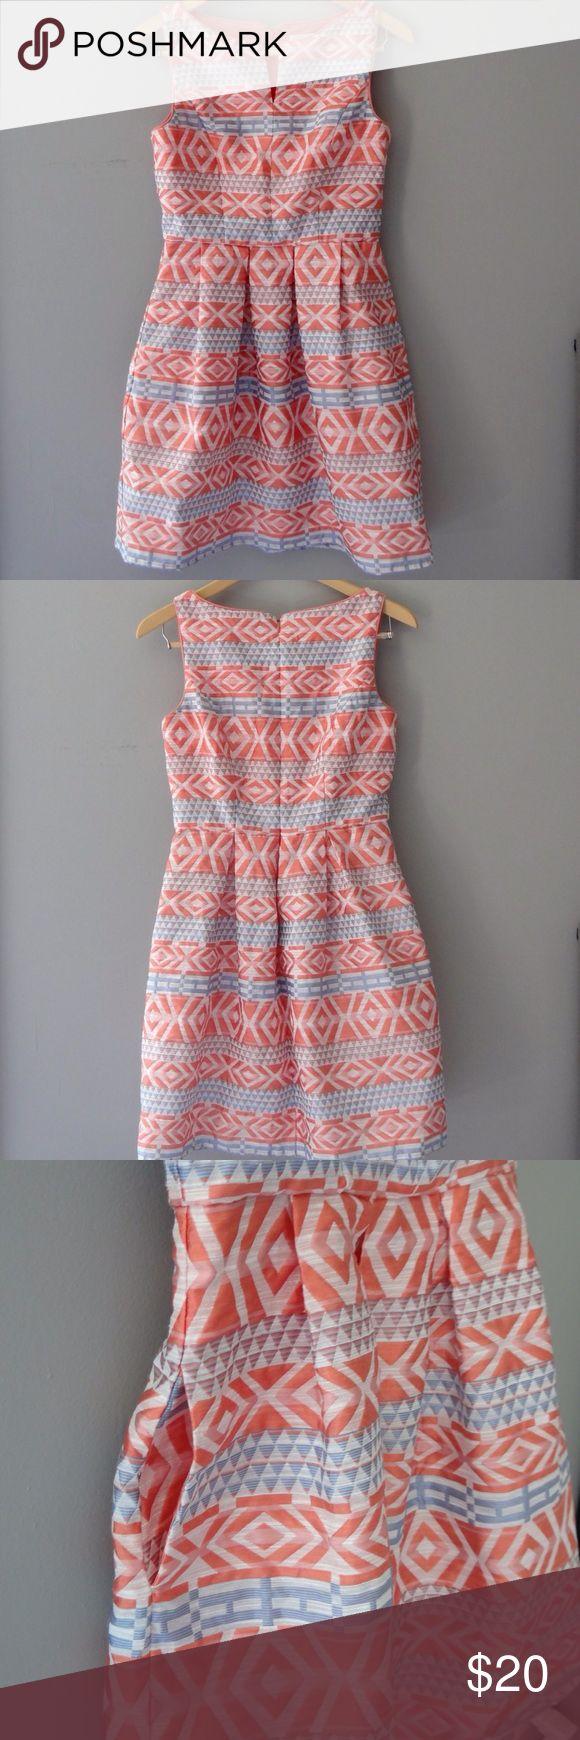 Jessica Simpson Sleeveless Dress Pre-loved Jessica Simpson Sleeveless dress with pockets. Dress is Partially linned. Jessica Simpson Dresses Mini